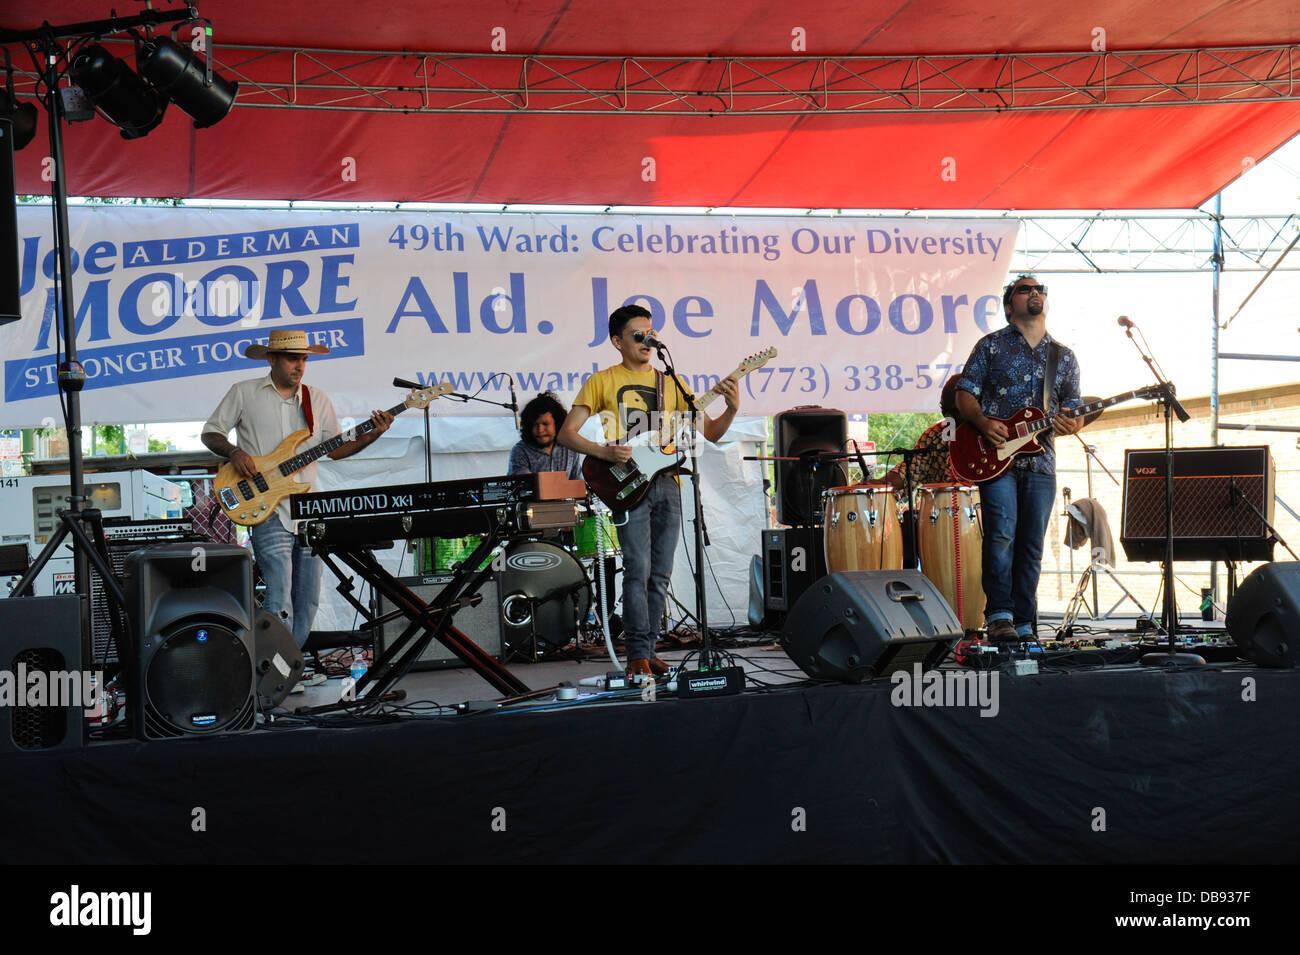 'Celebrate Clark St. Festival, Chicago, Illinois. 'Dos Santos Anti-Beat' cumbia band on stage. - Stock Image